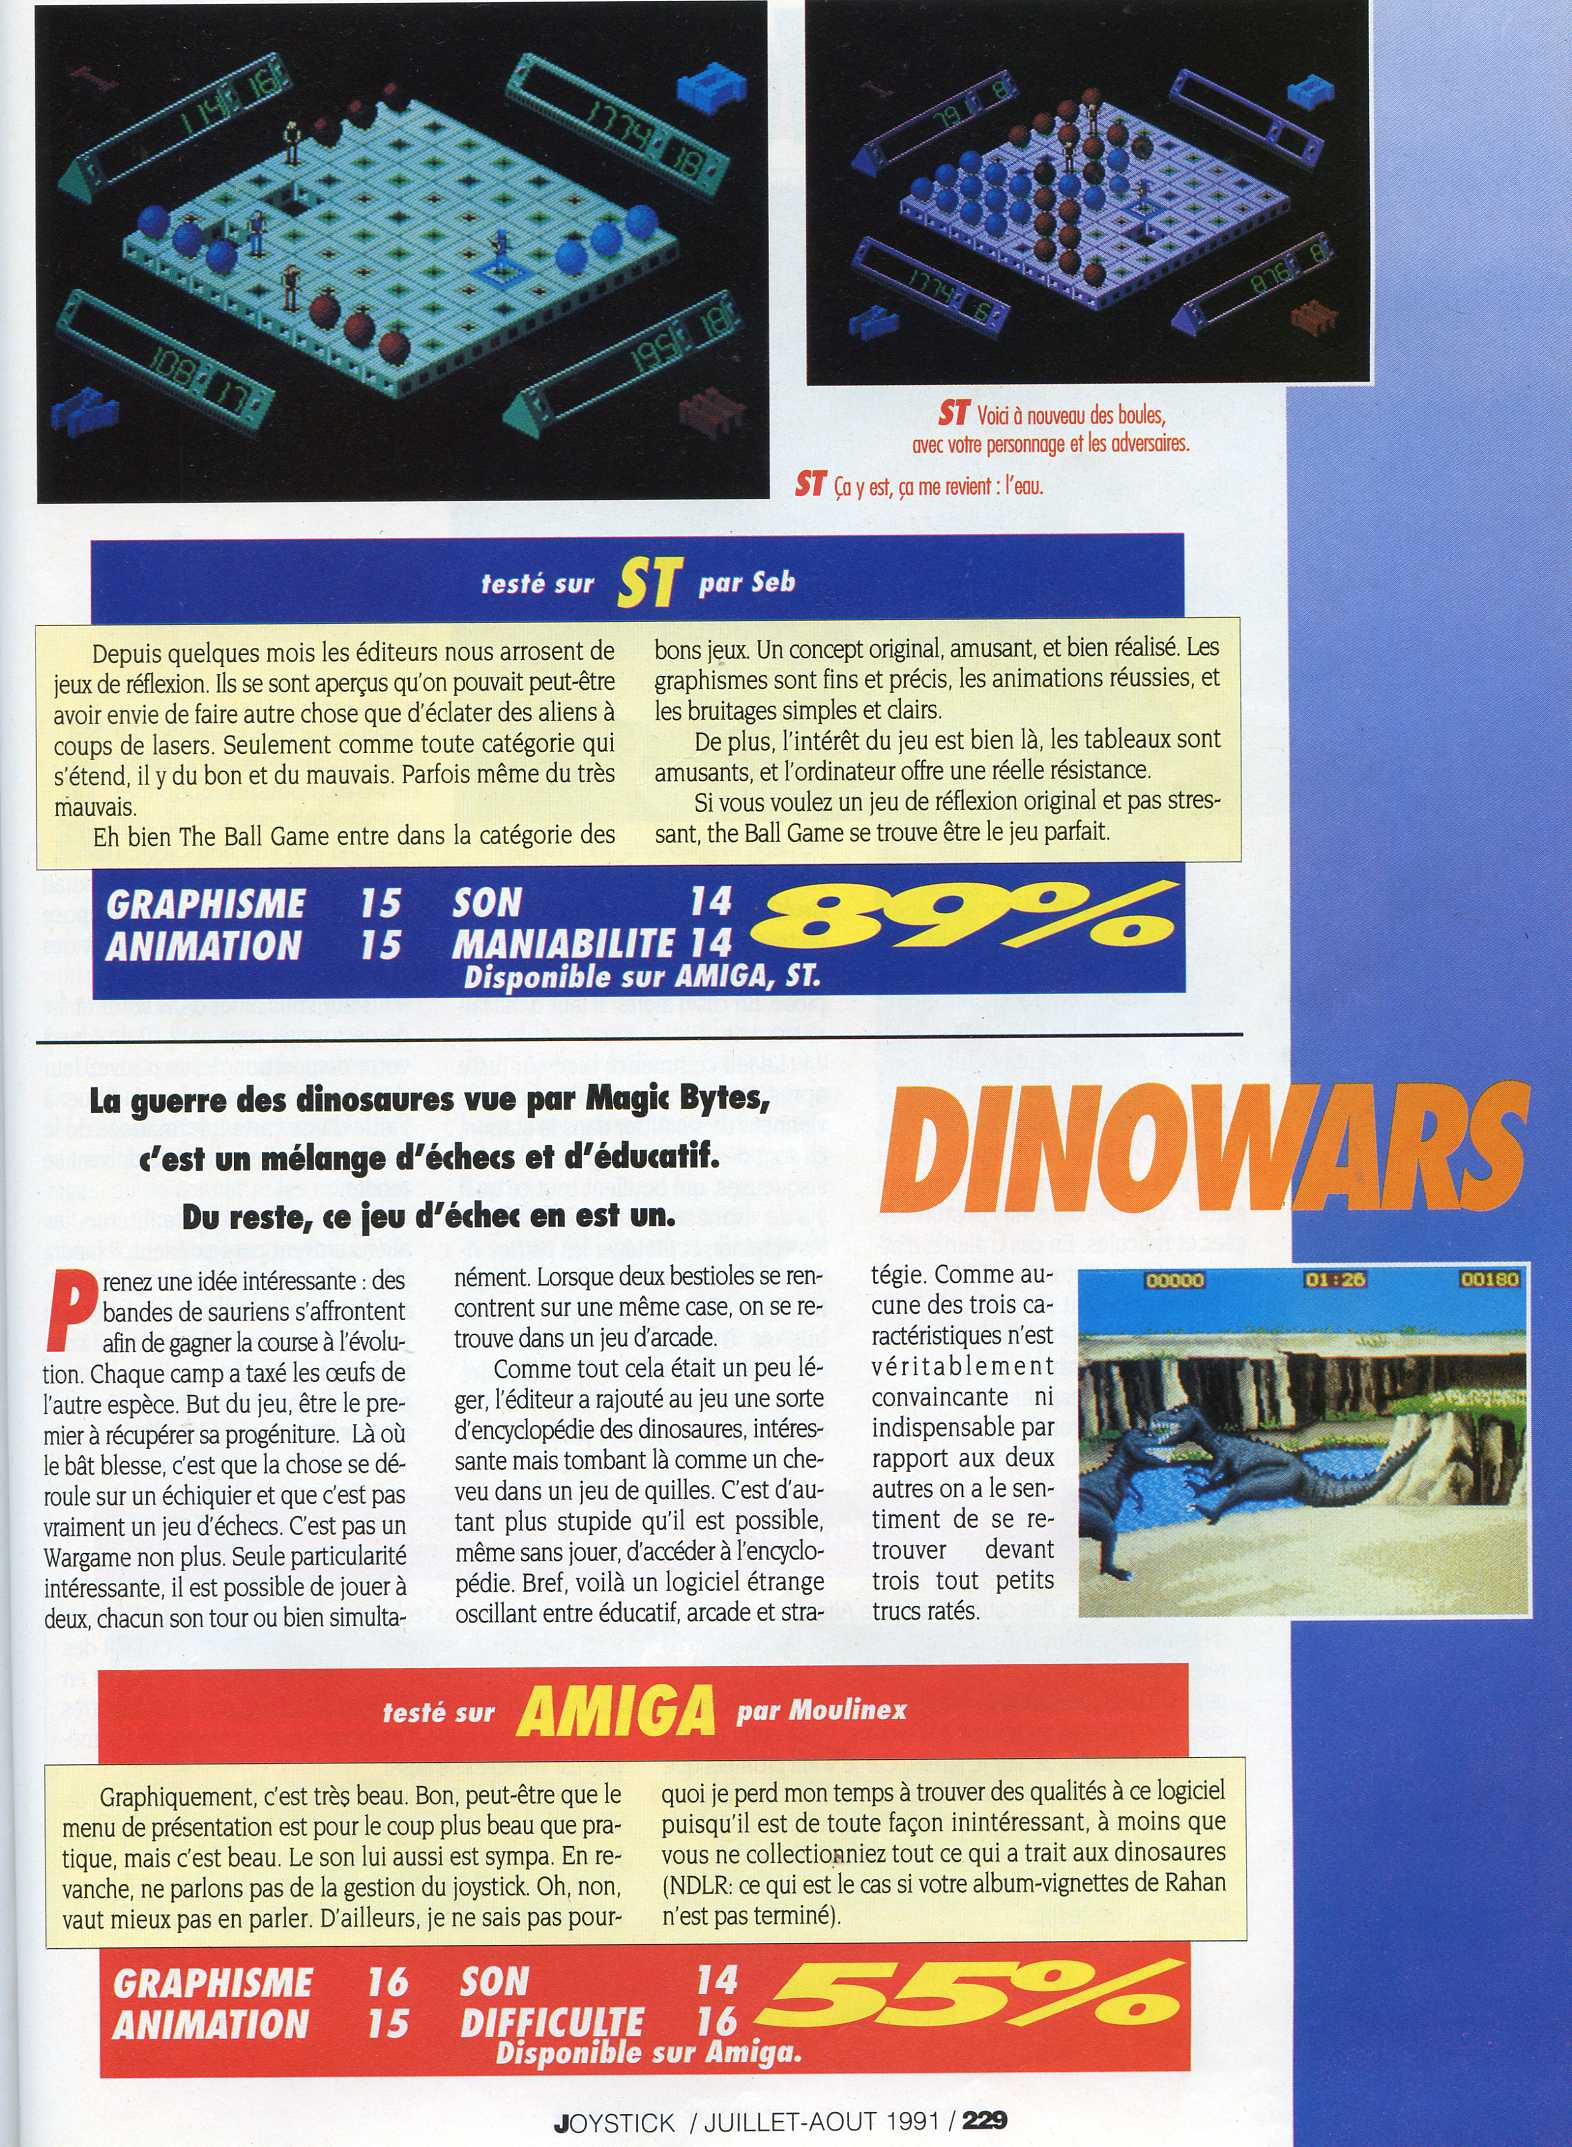 Dino Wars - Wikipedia